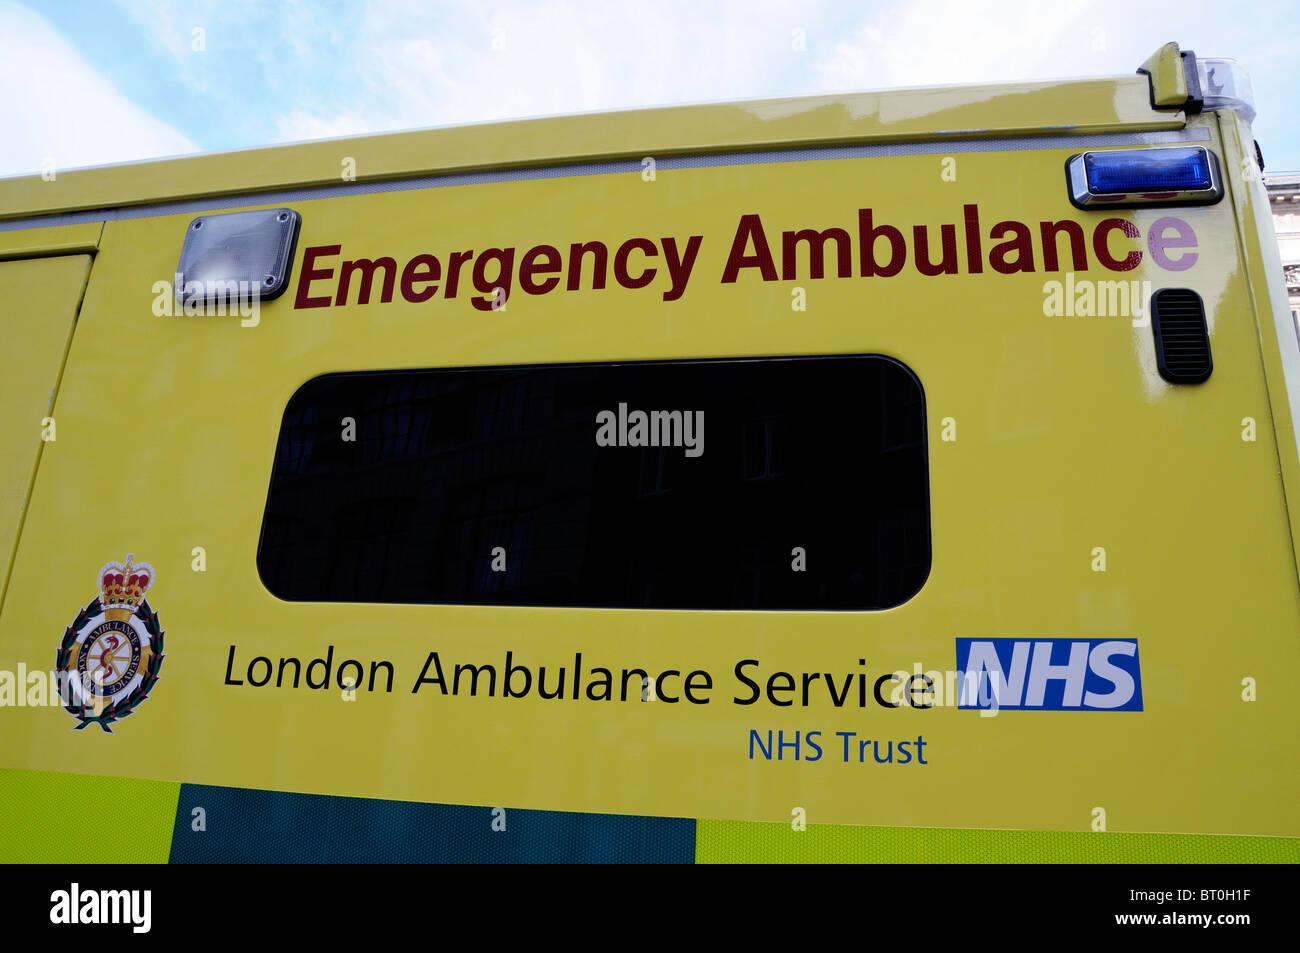 Close-up of a London Emergency Ambulance showing NHS logo outside Smithfield Ambulance Station City of London England - Stock Image